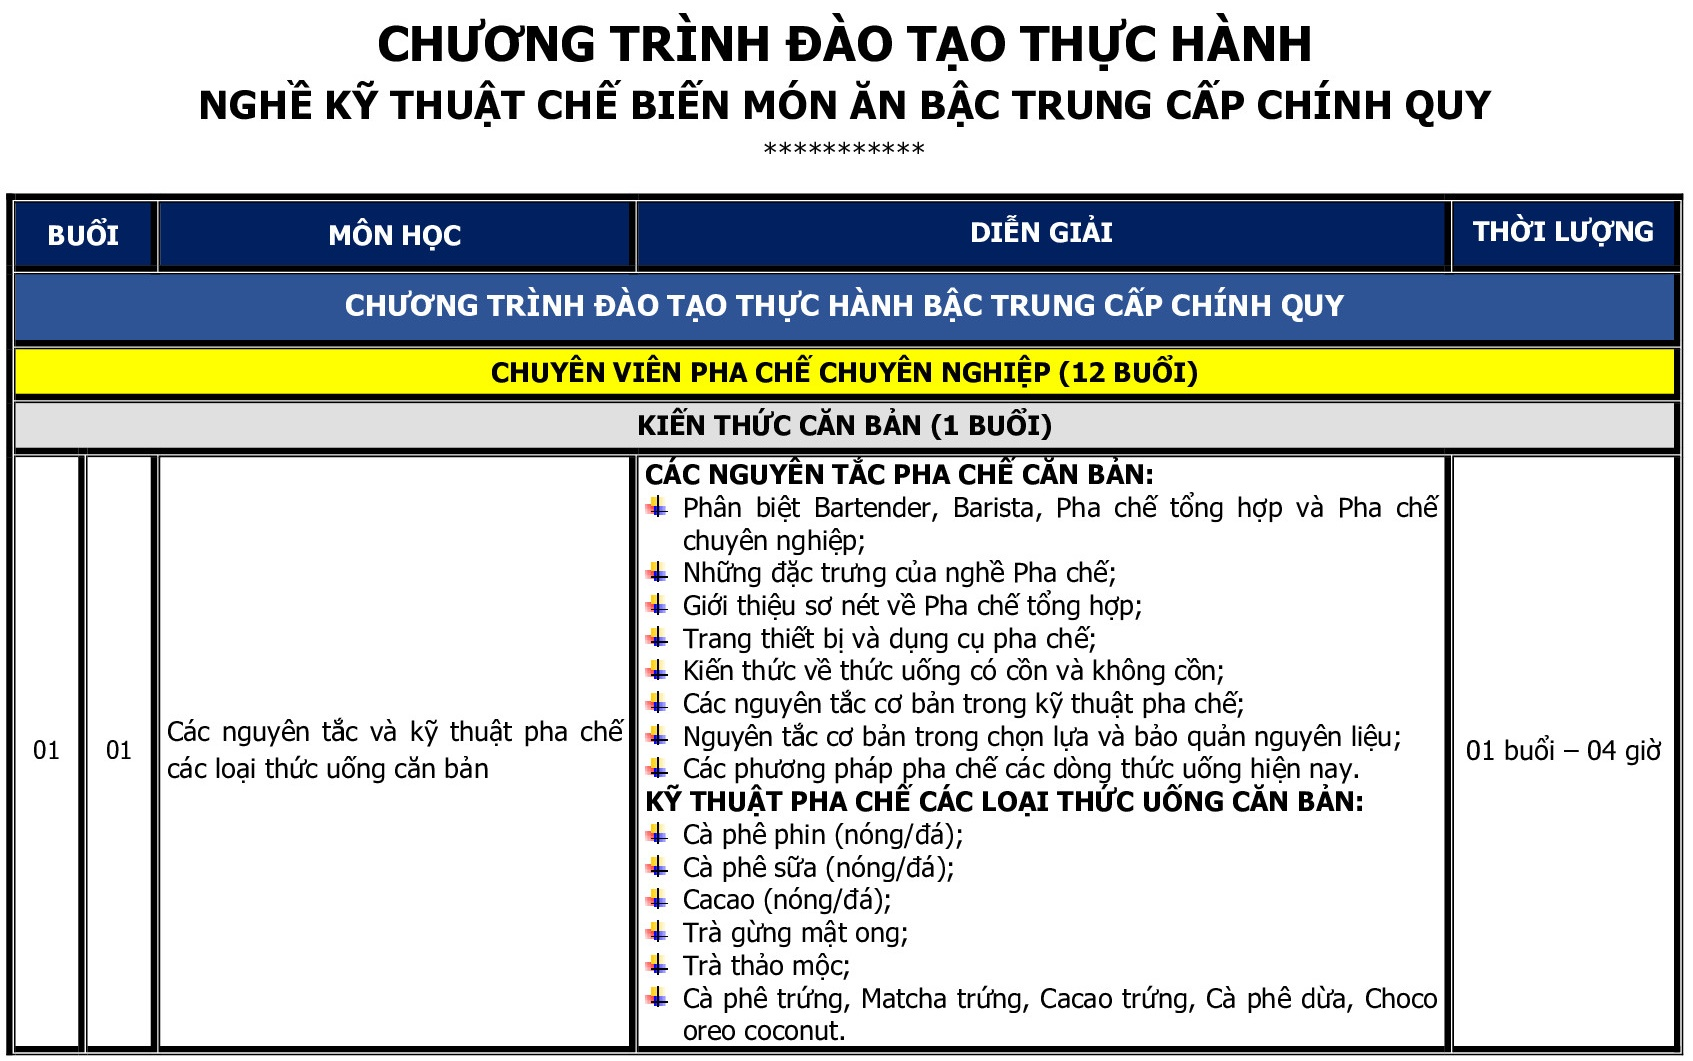 CT DAO TAO THUC HANH BAC TRUNG CAP_p001